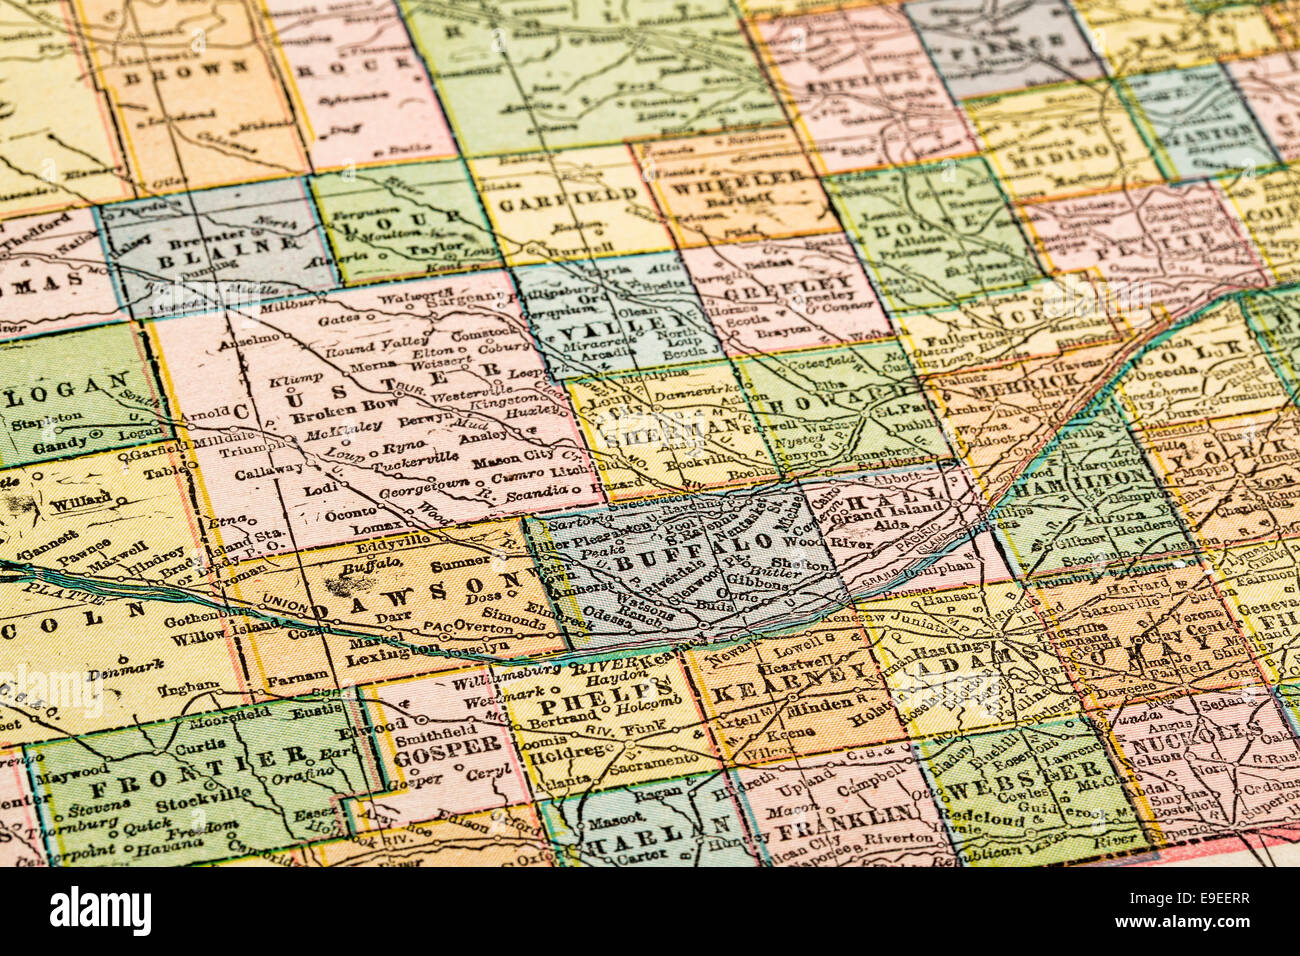 Nebraska Map Vintage Stock Photos & Nebraska Map Vintage Stock ...